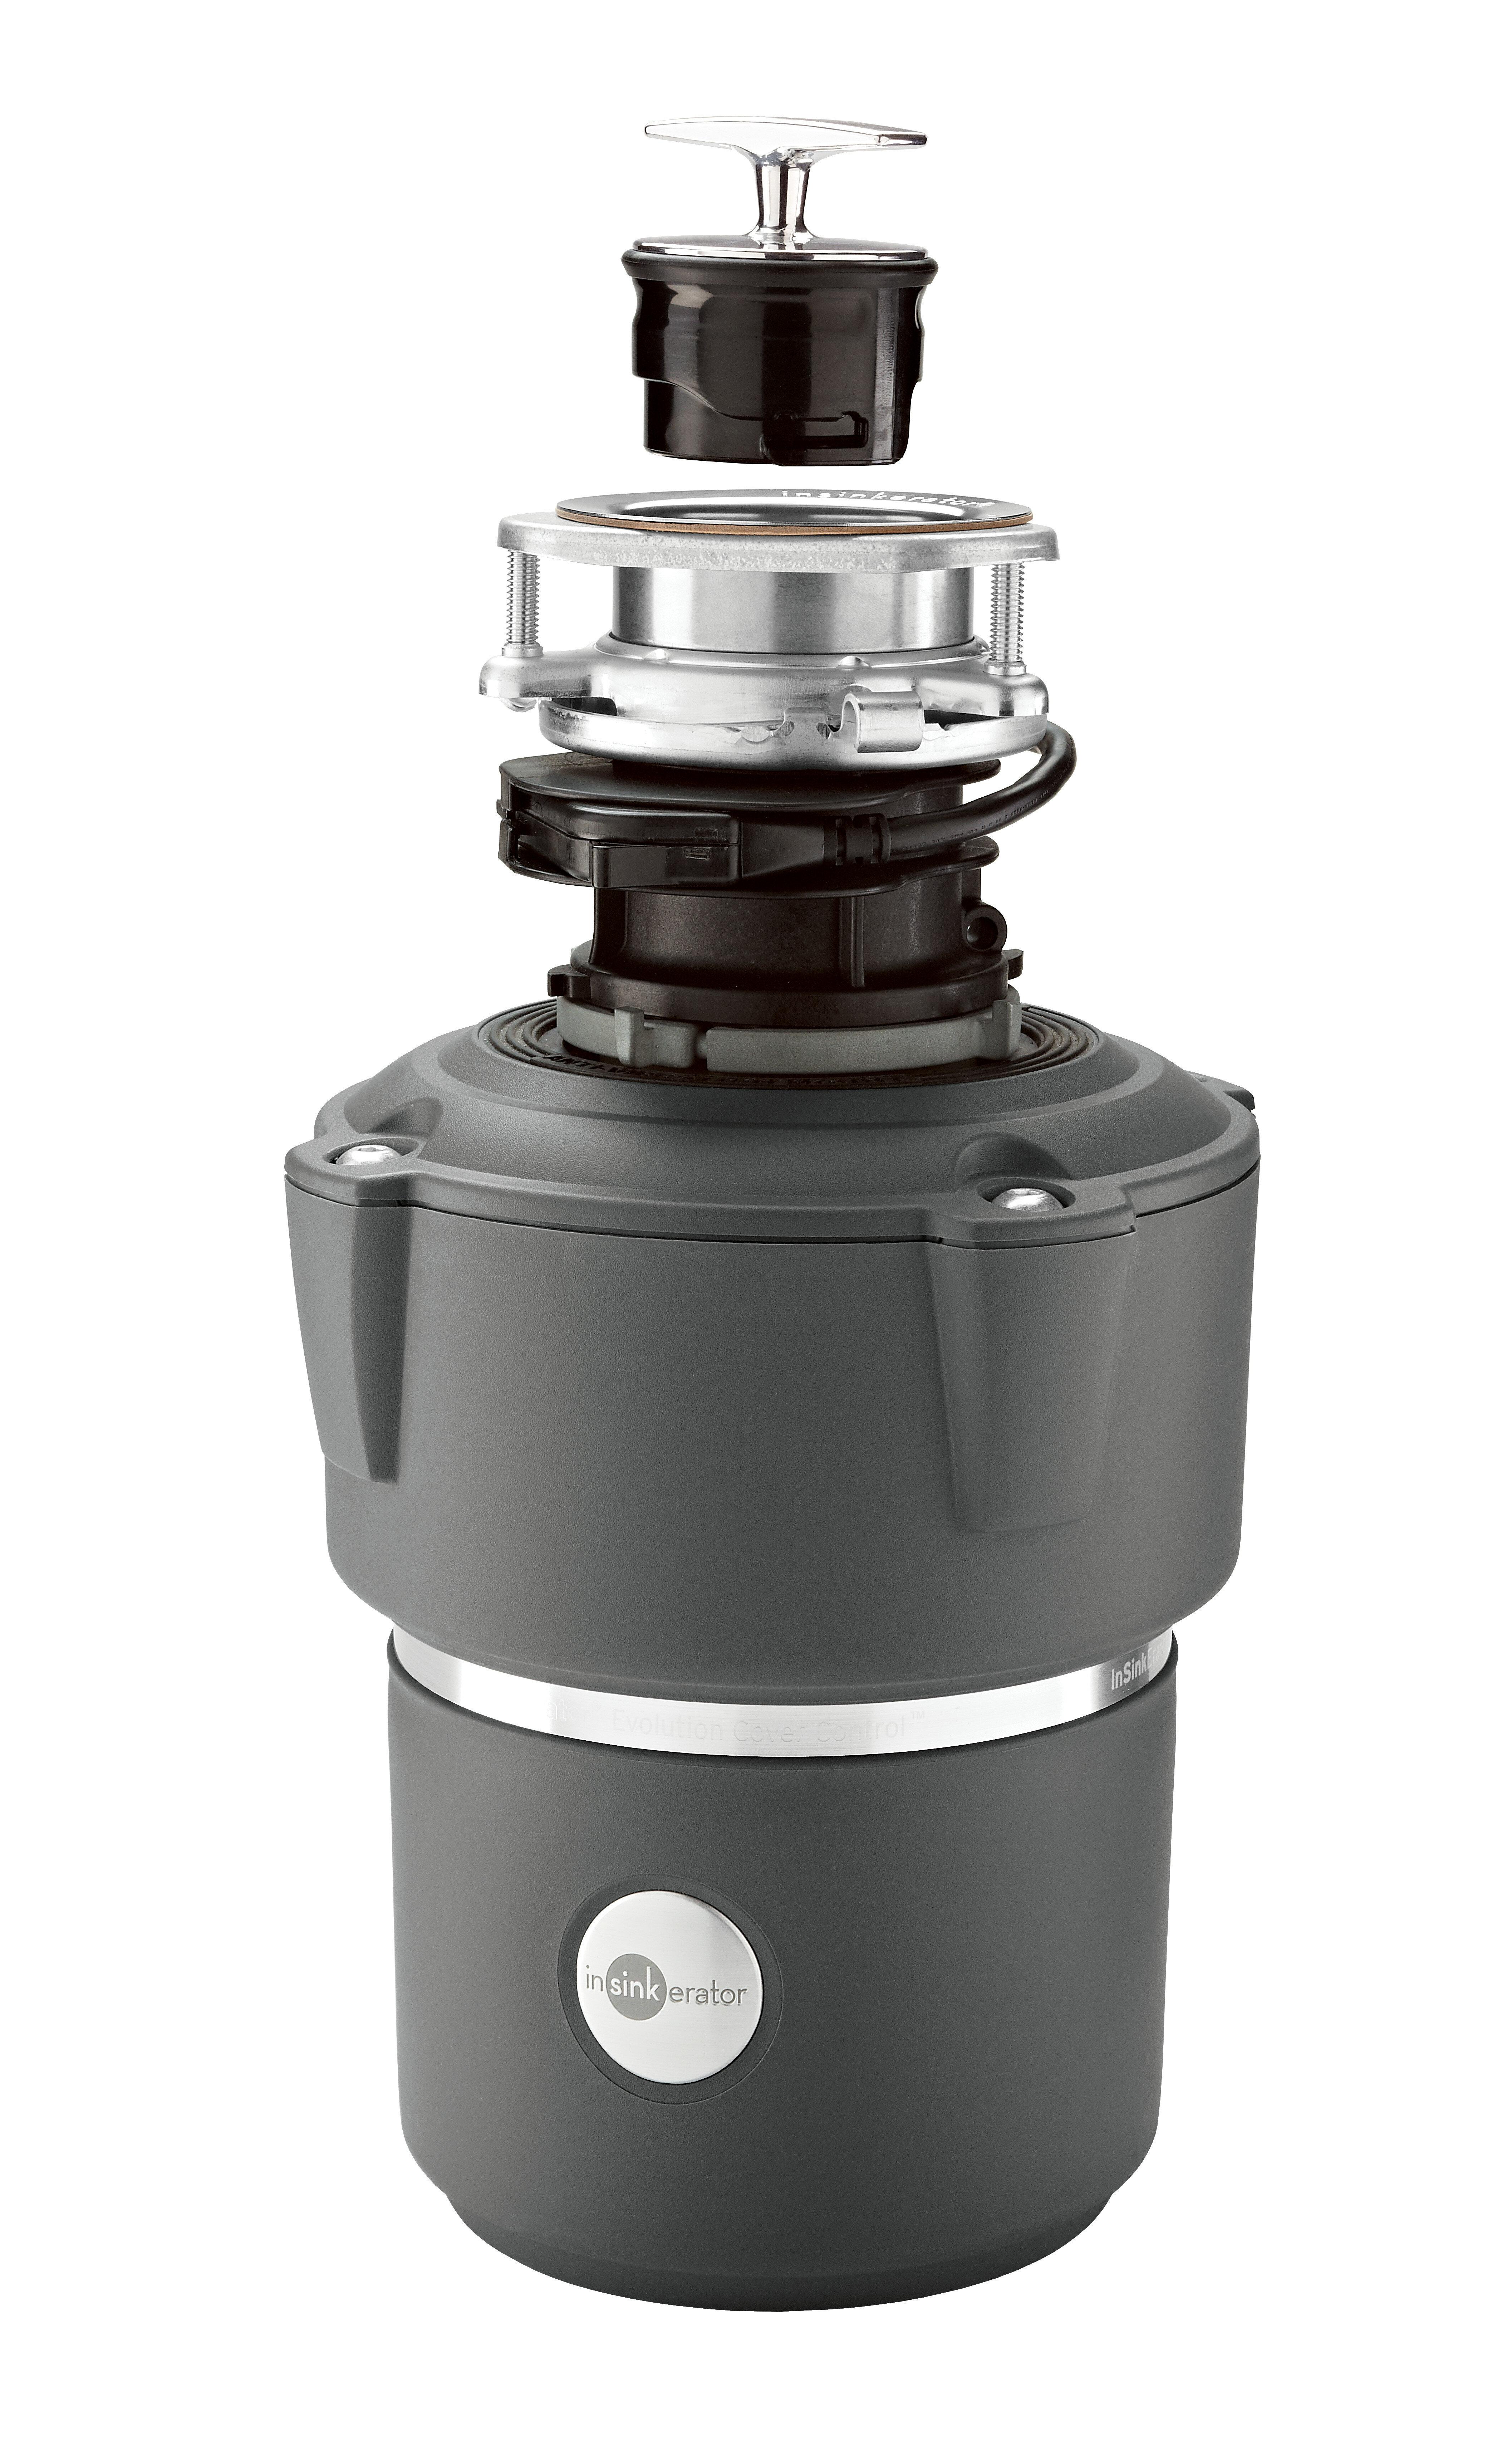 Insinkerator Evolution 3 4 Hp Batch Garbage Disposal Wayfair